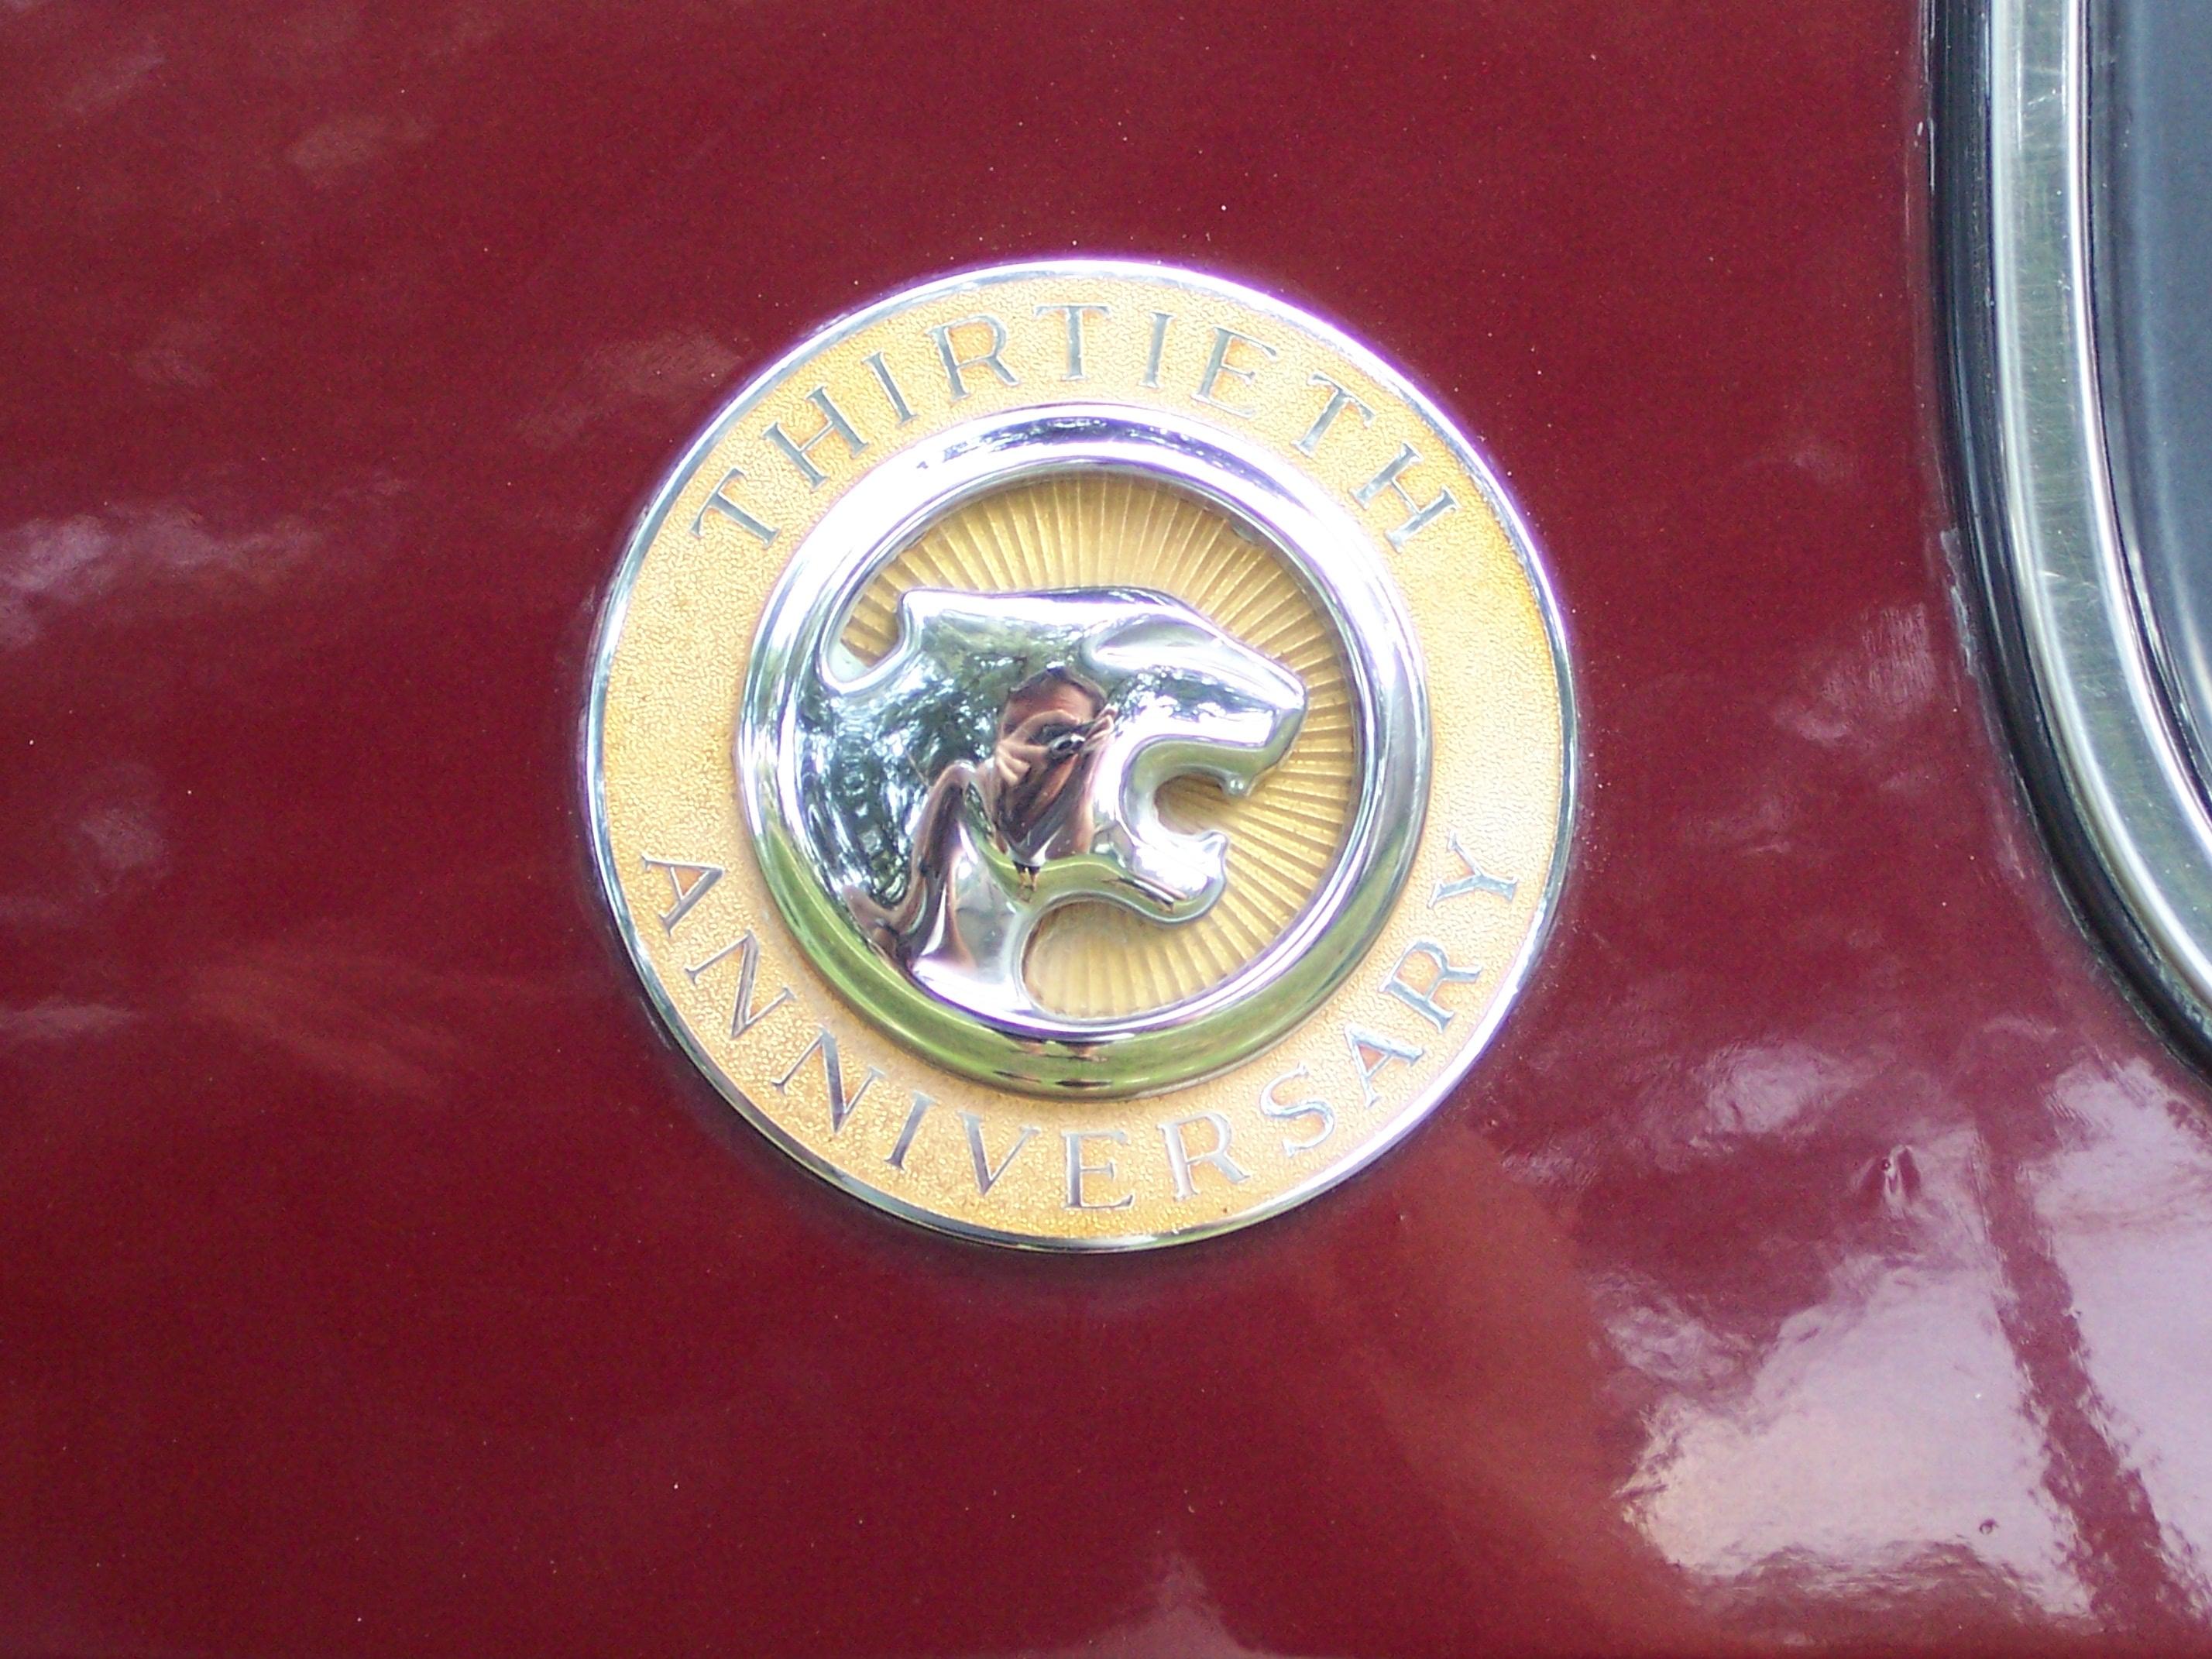 Cougar 30th Anniversary emblem